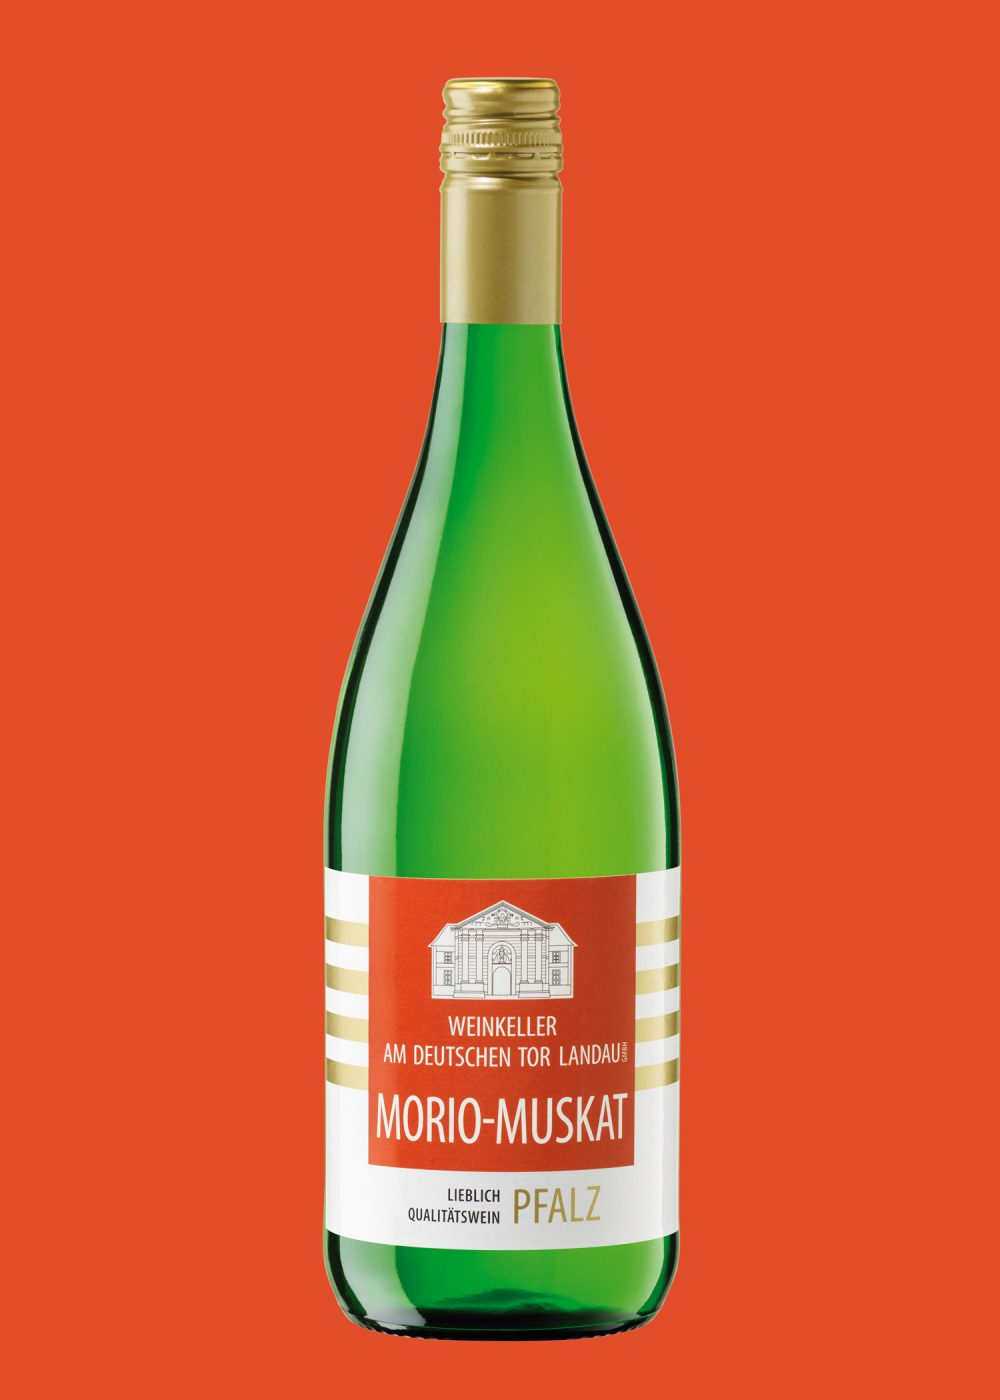 Morio-Muskat lieblich